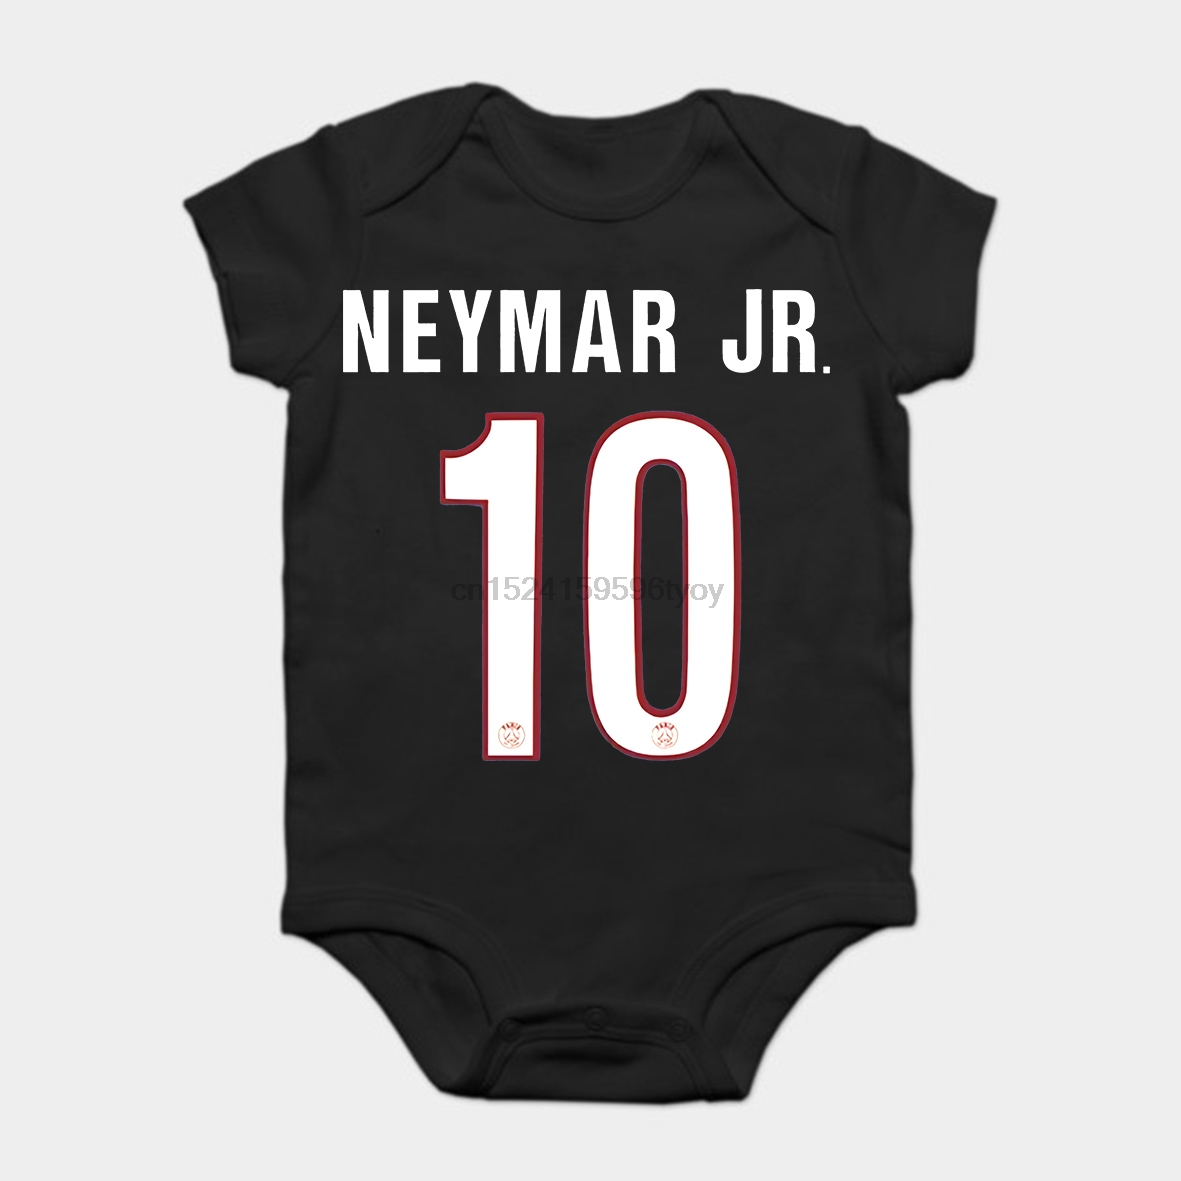 Beautiful Baby Onesie Baby Bodysuits Kid T Shirt Funny-men- -white- --black-tee-paris-10-neymar-jr-jersey-shirtfootball